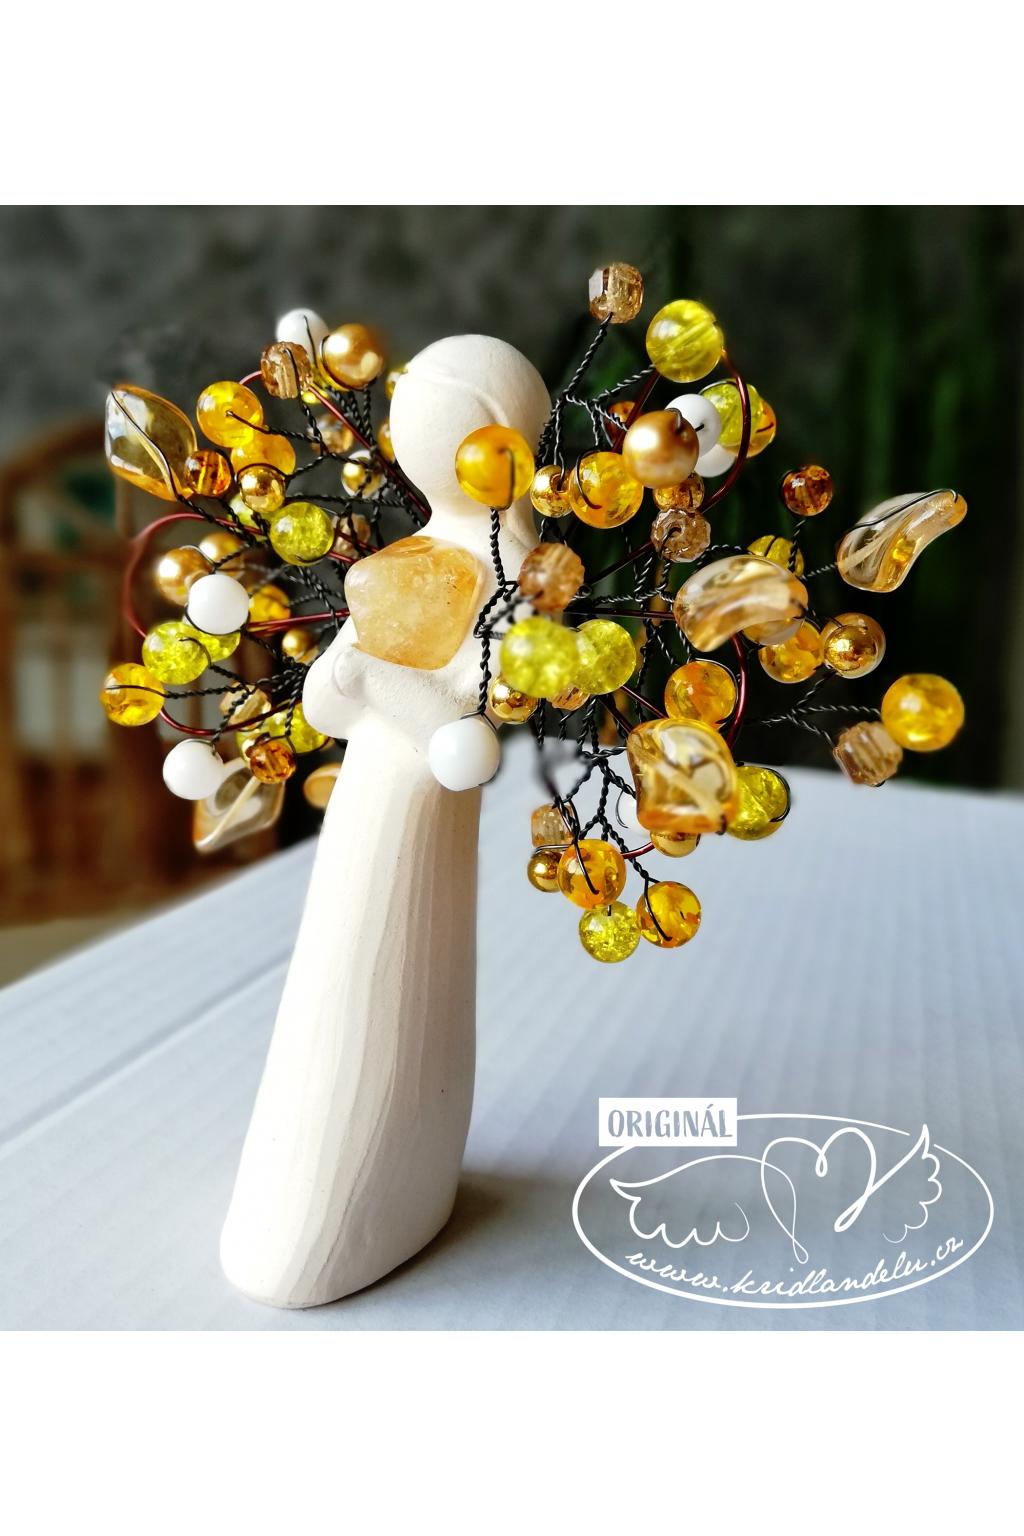 Anděl s citrínem a křídly z korálků 11cm